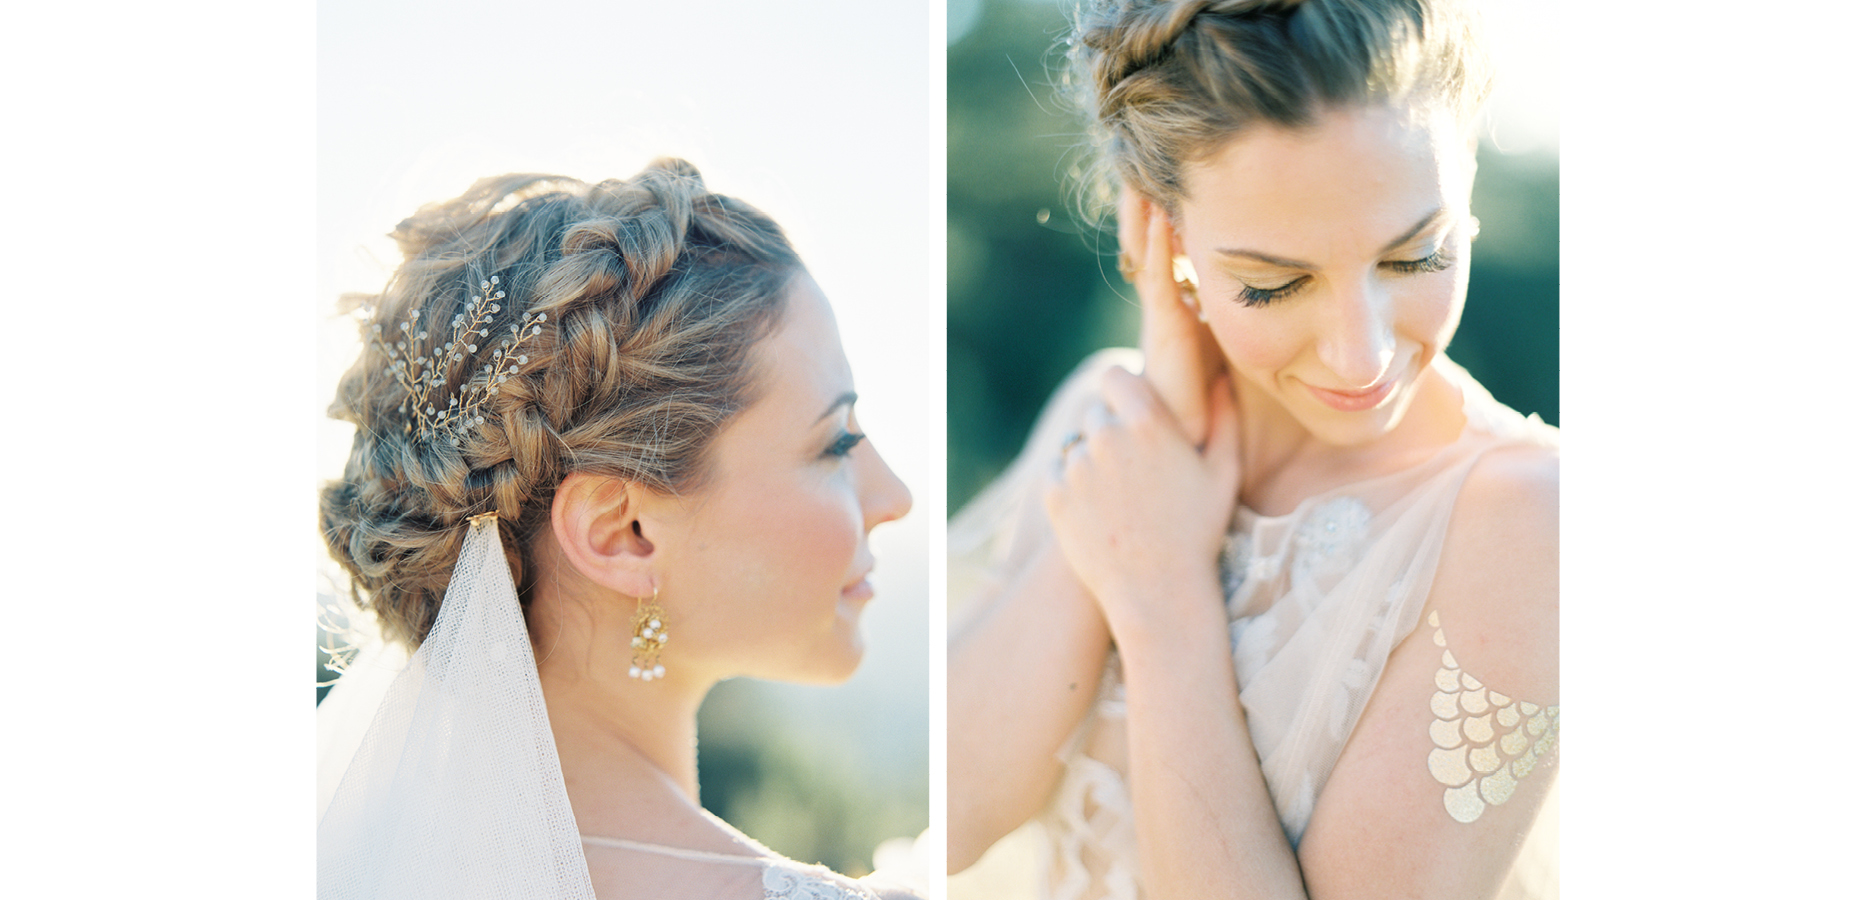 Jess-Wilcox-Hair-Makeup-Wedding_portfolio9.jpg